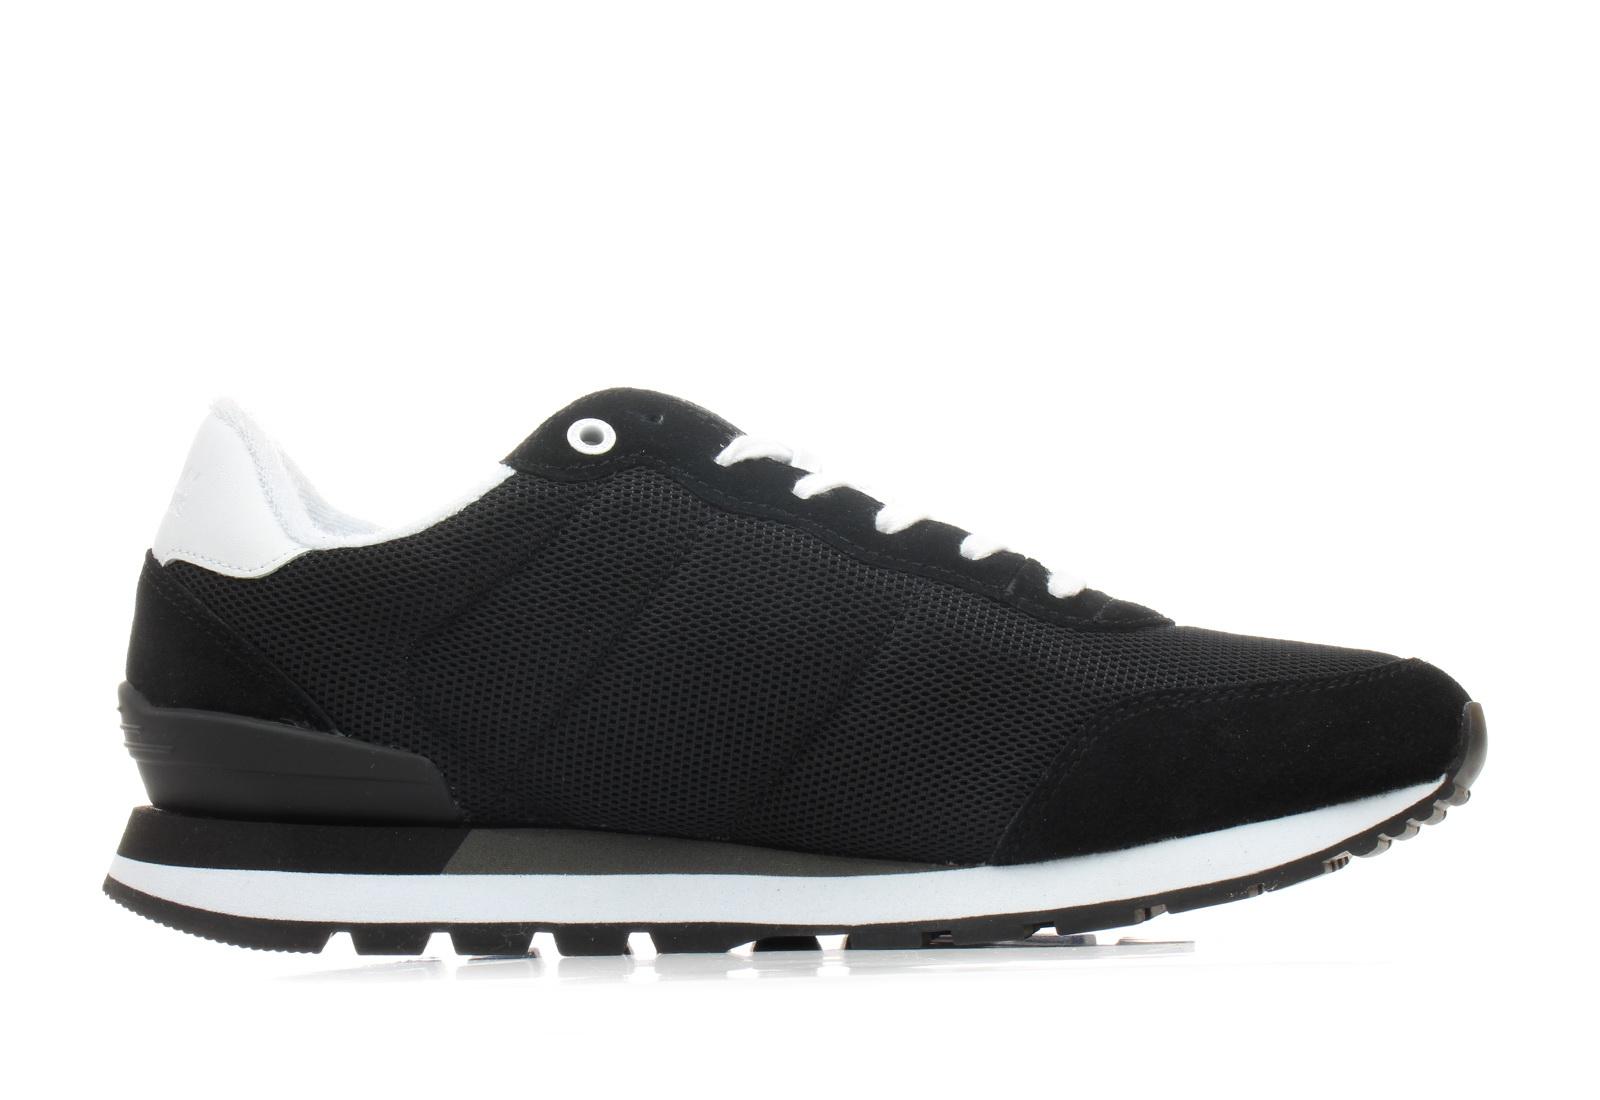 a5ac64fb3 Tommy Hilfiger Shoes - Baron 1c - 19S-0261-990 - Online shop for ...